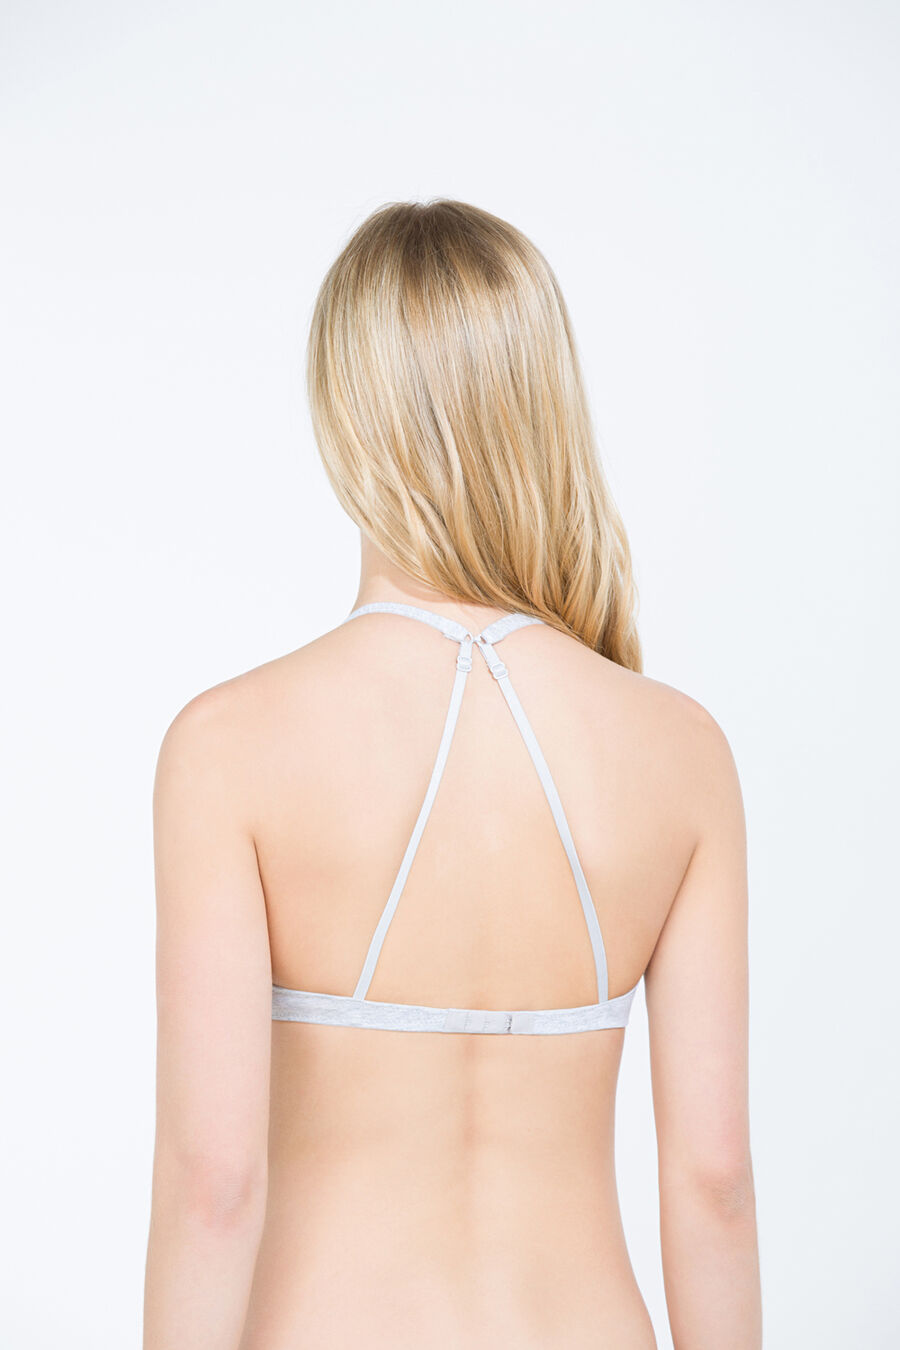 Cotton unpadded wireless bra